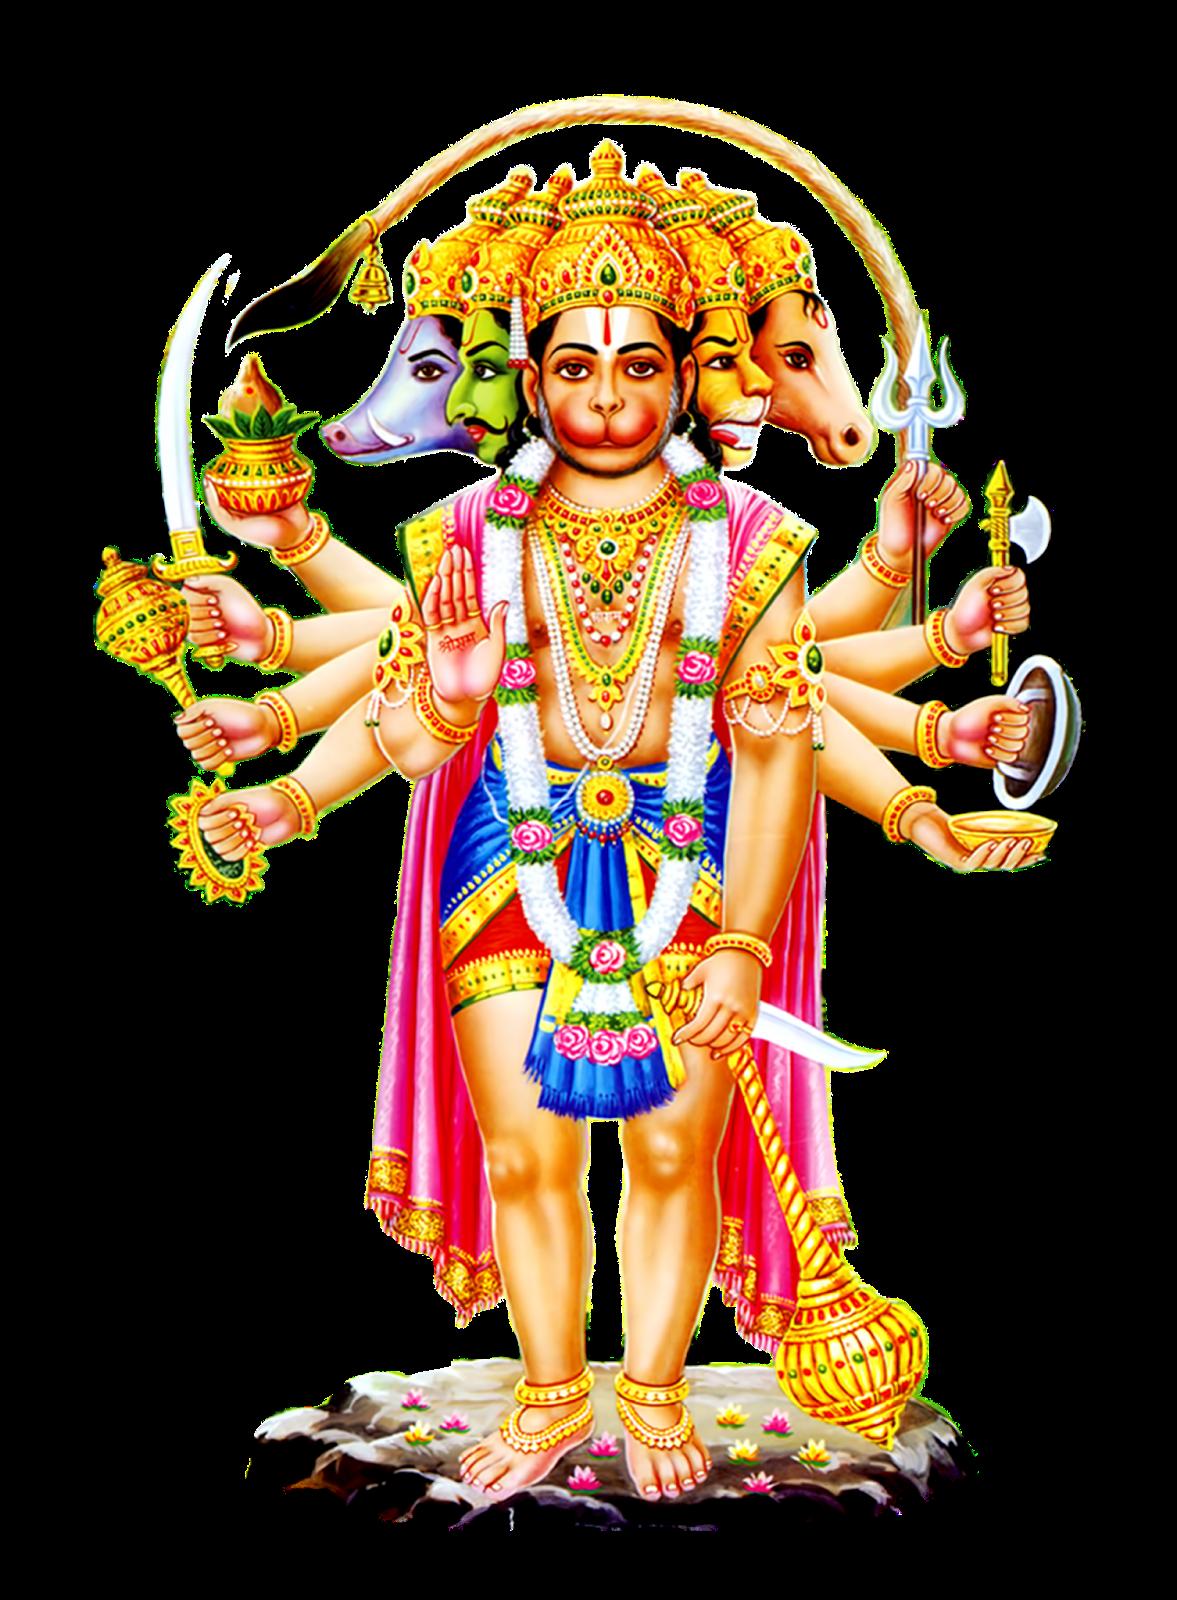 About the temple char dham hindu temple the woodlands tx usa - Panchmukhi hanuman image ...